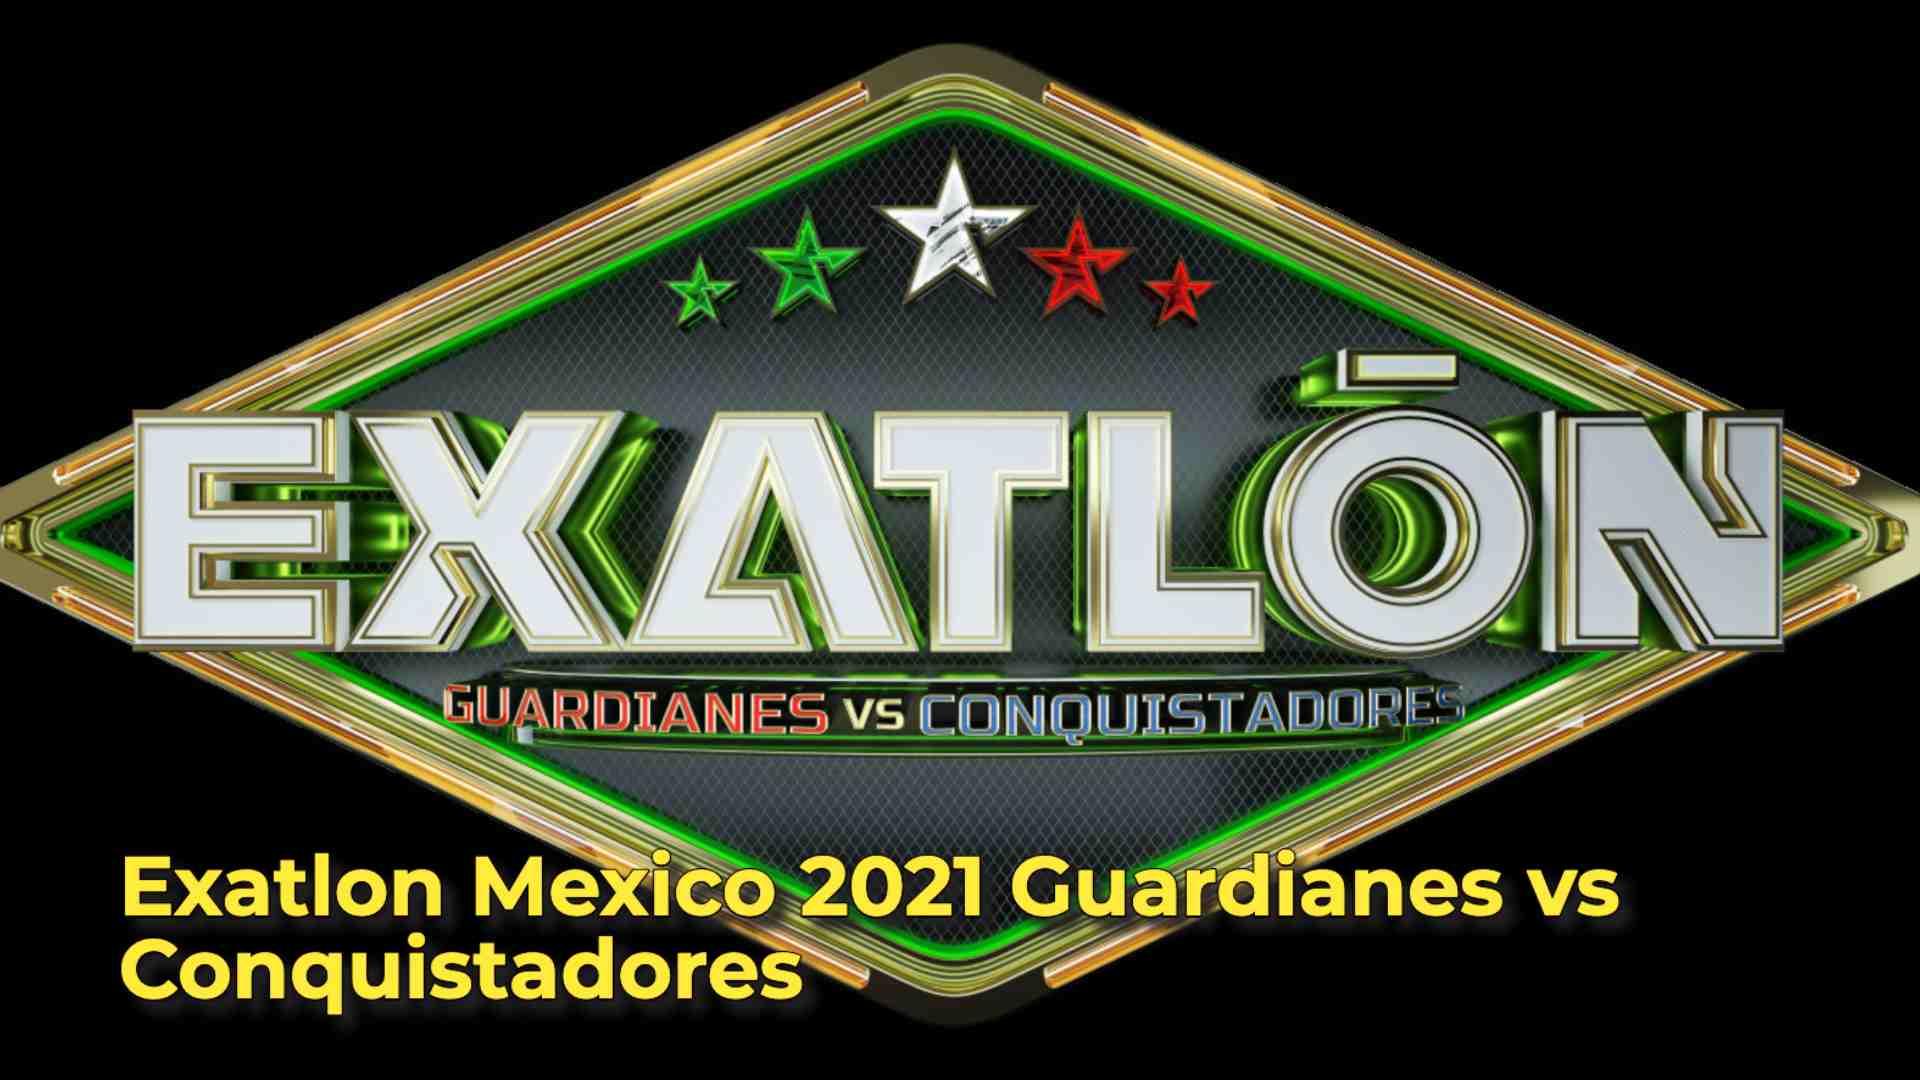 Exatlon Mexico 2021 Guardianes vs Conquistadores